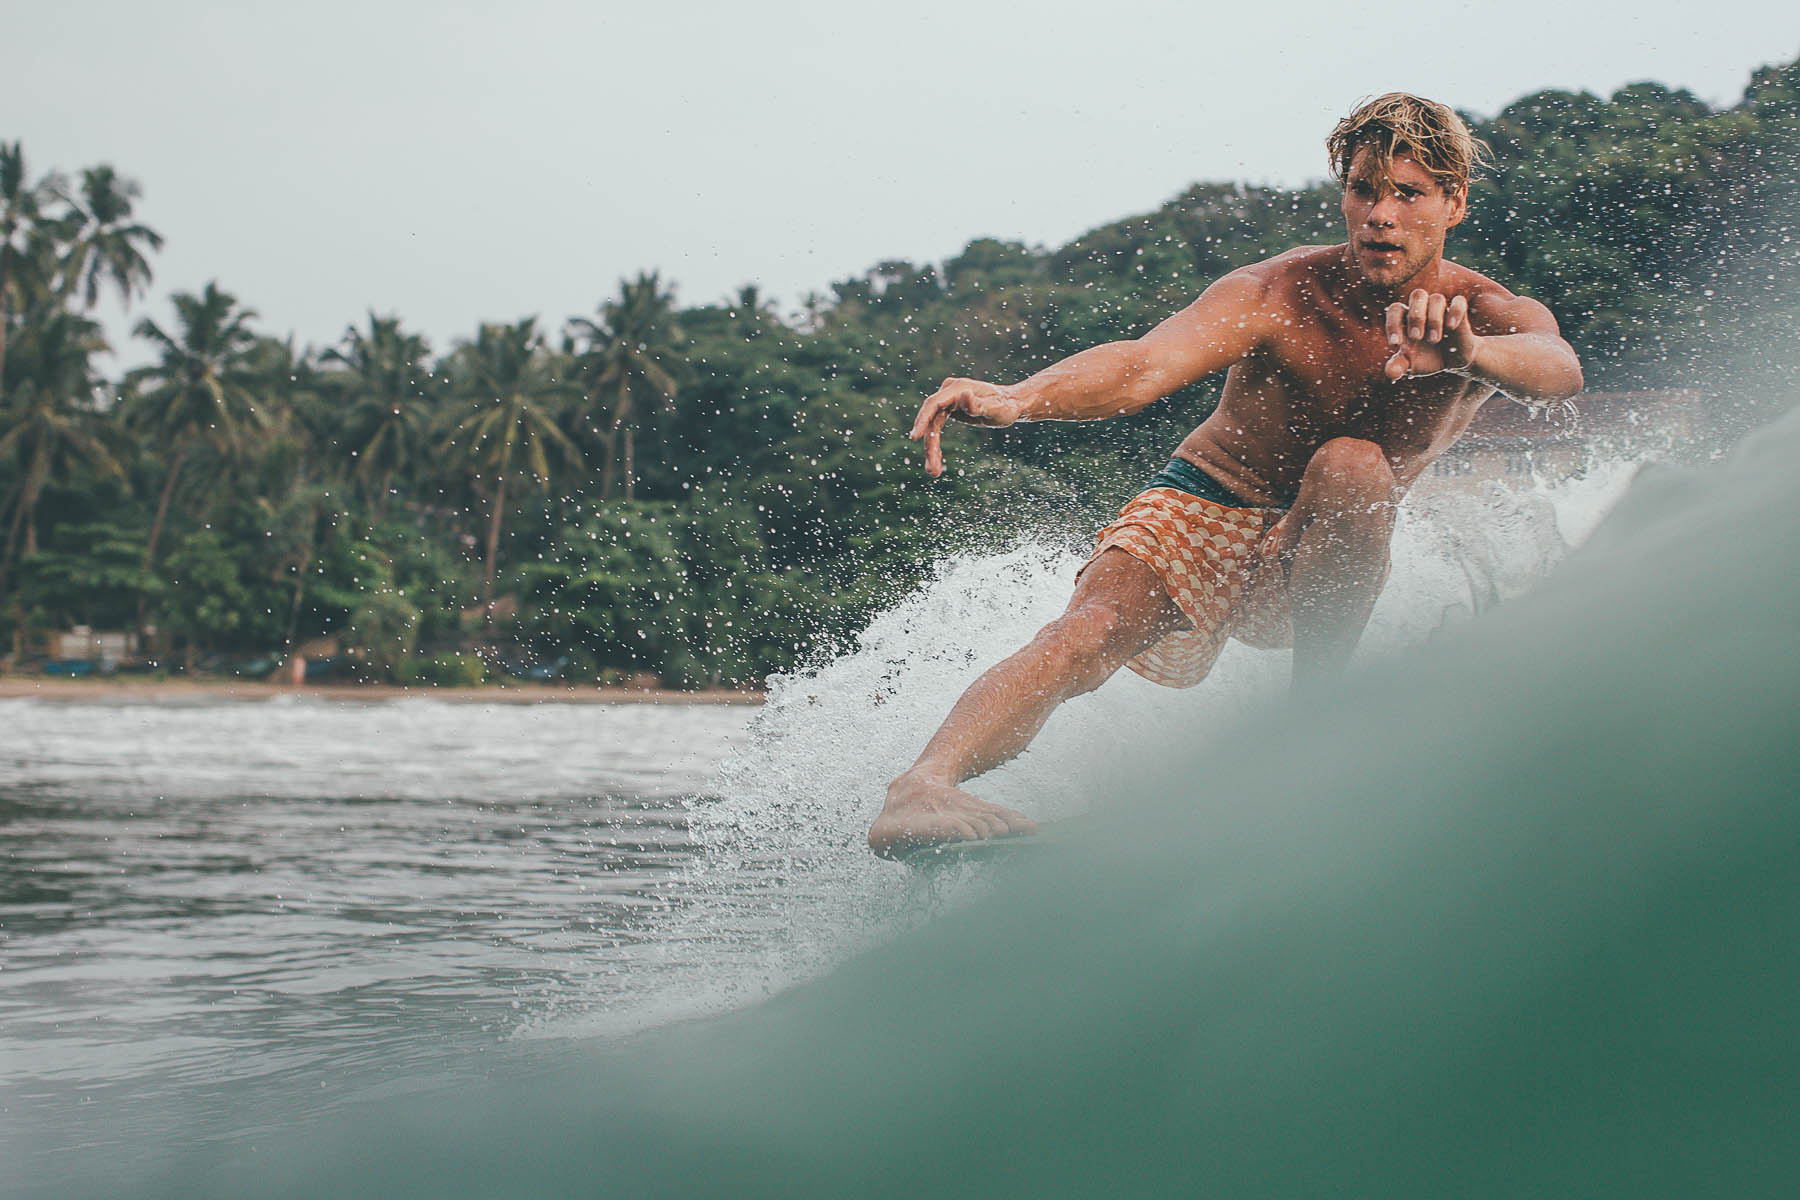 Surf-Camp-Yoga-Retreat-Sri Lanka-Hikkaduwa-Midigama-Arugam Bay-Pottuvil-Mirissa-Ahangama-Madiha-Medawatta-Sunshinestories-surf-travel-blog-Sunshineprint-highresM06A8799.jpg